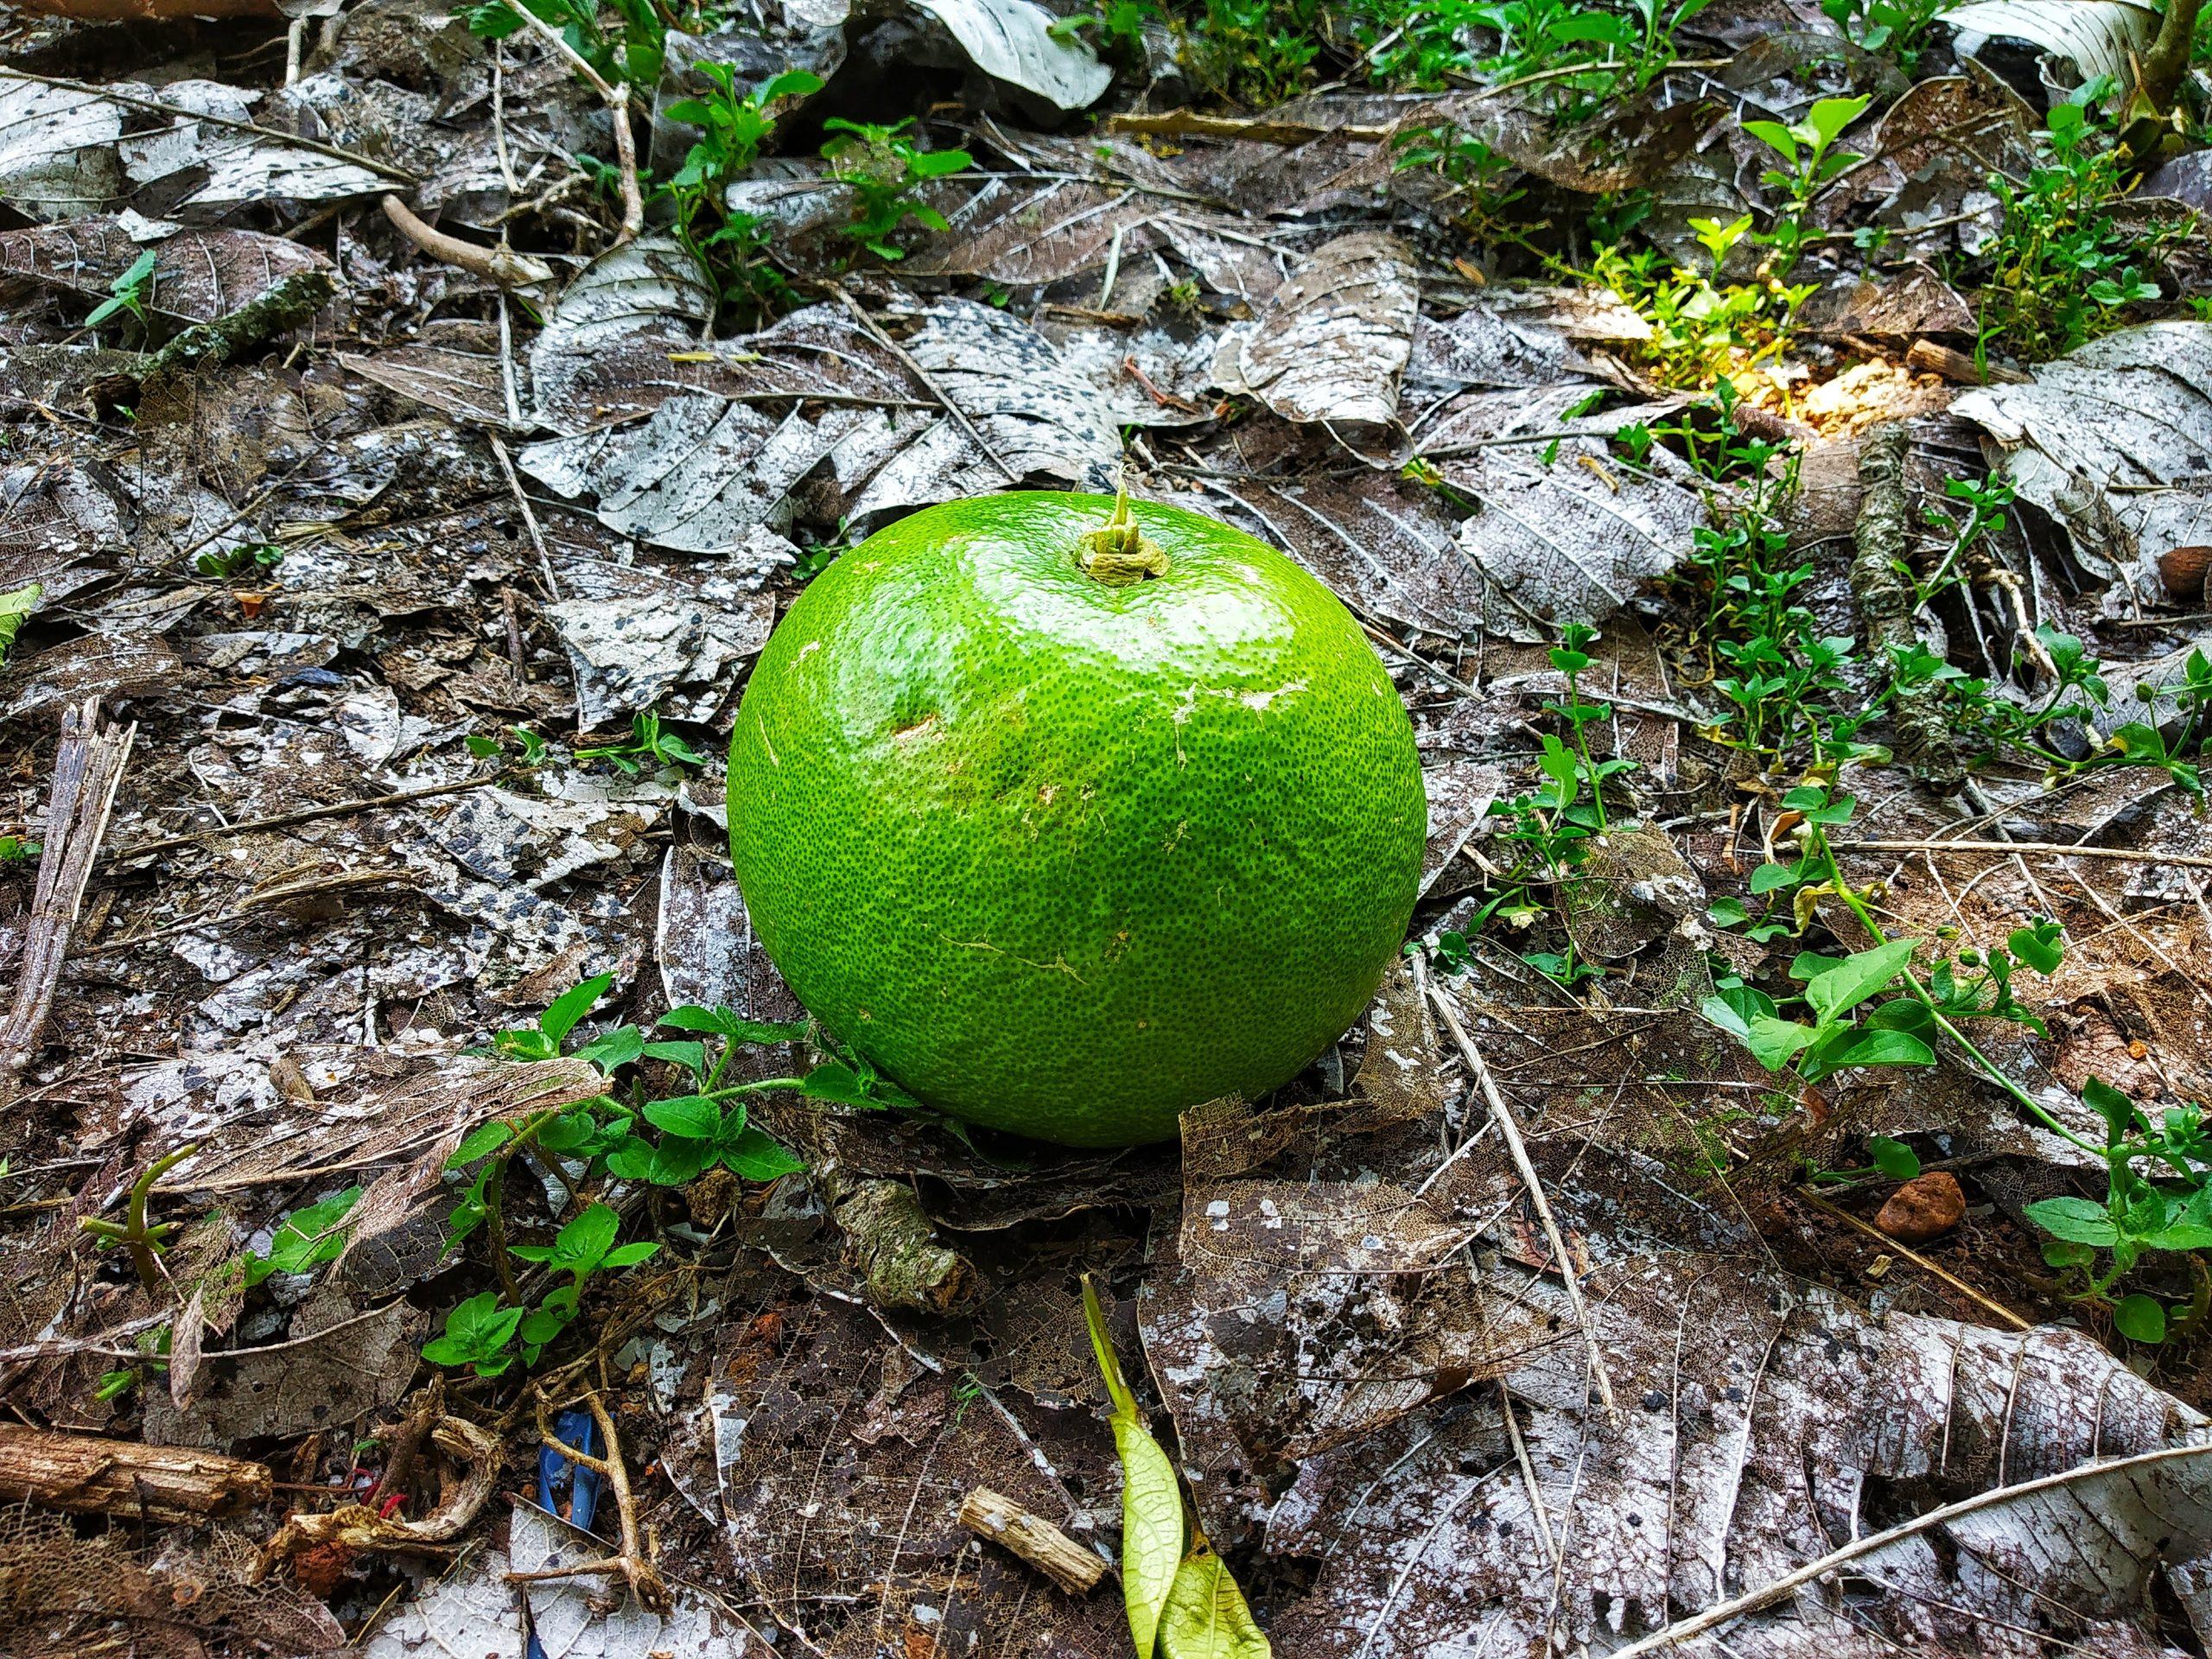 A fallen green orange